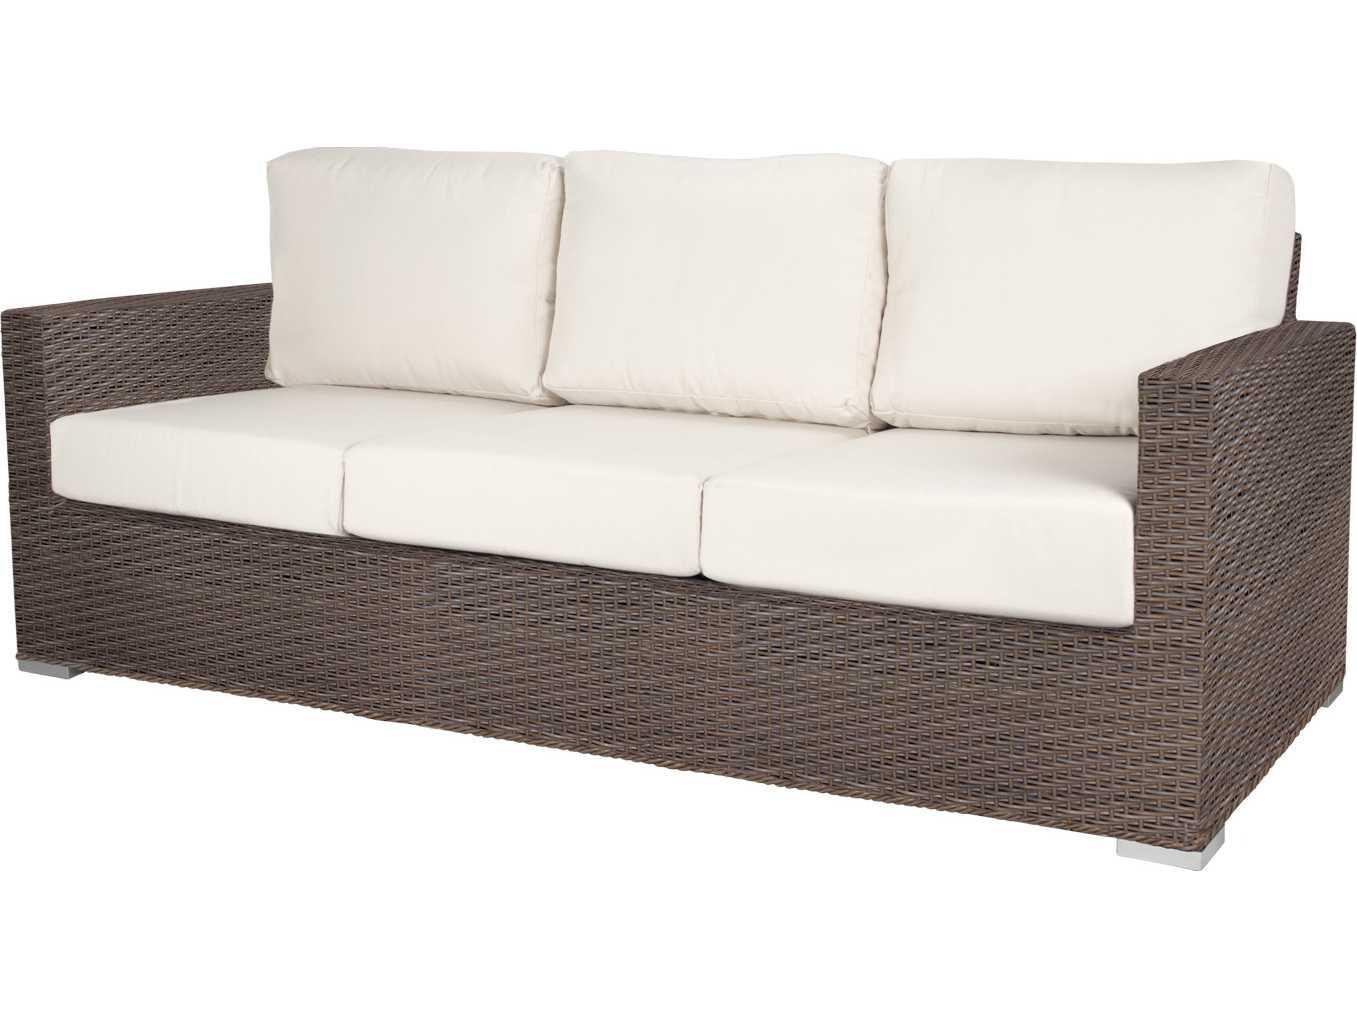 Source outdoor furniture lucaya wicker sofa scso2012103 for Source outdoor furniture